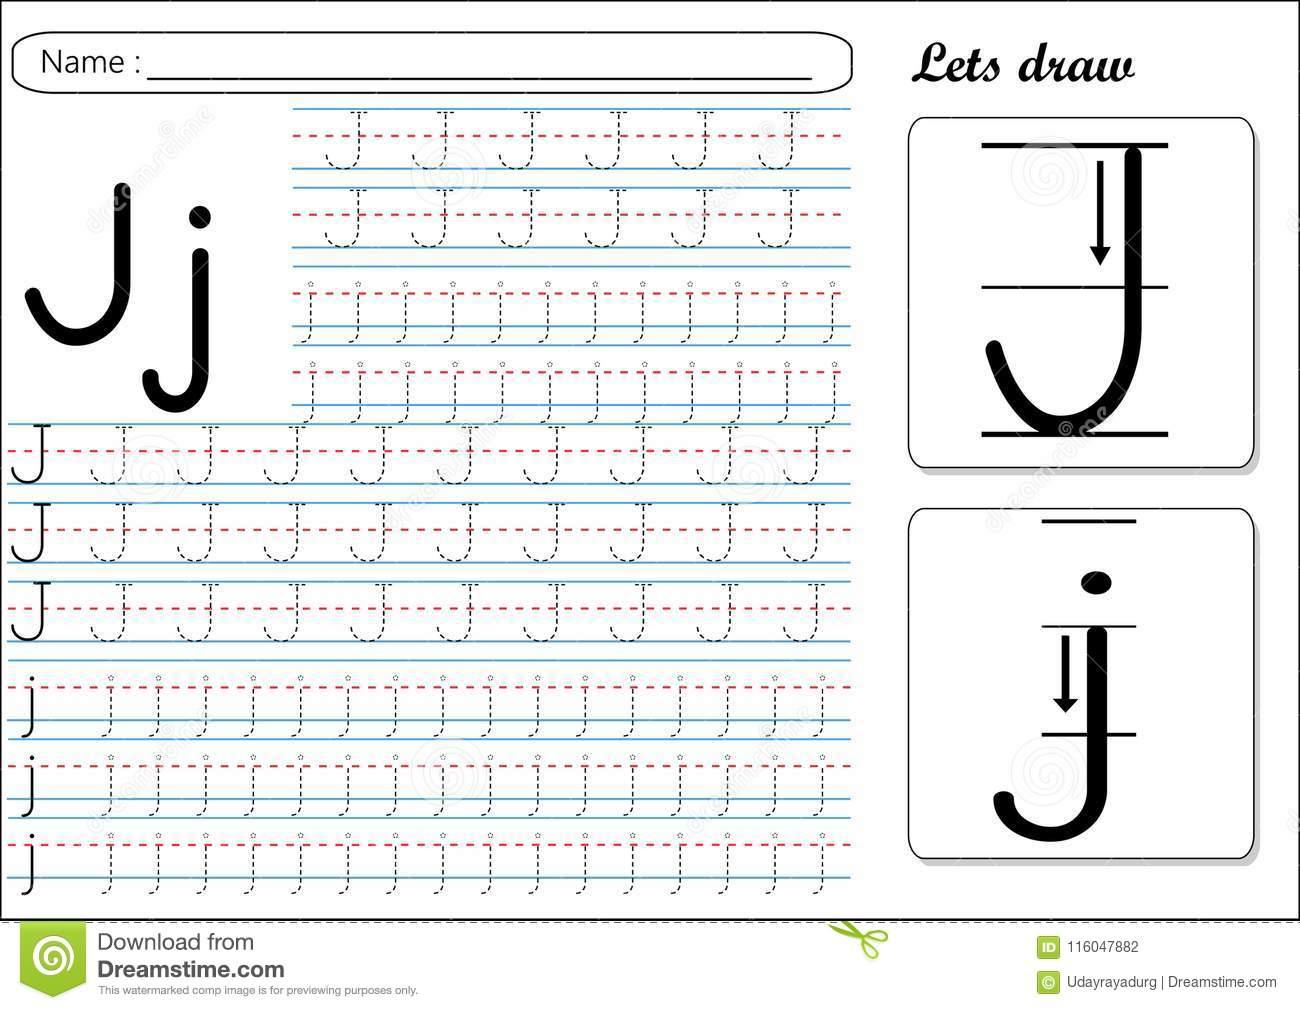 Tracing Worksheet -Jj Stock Vector. Illustration Of Spelling within Alphabet Tracing Letter J